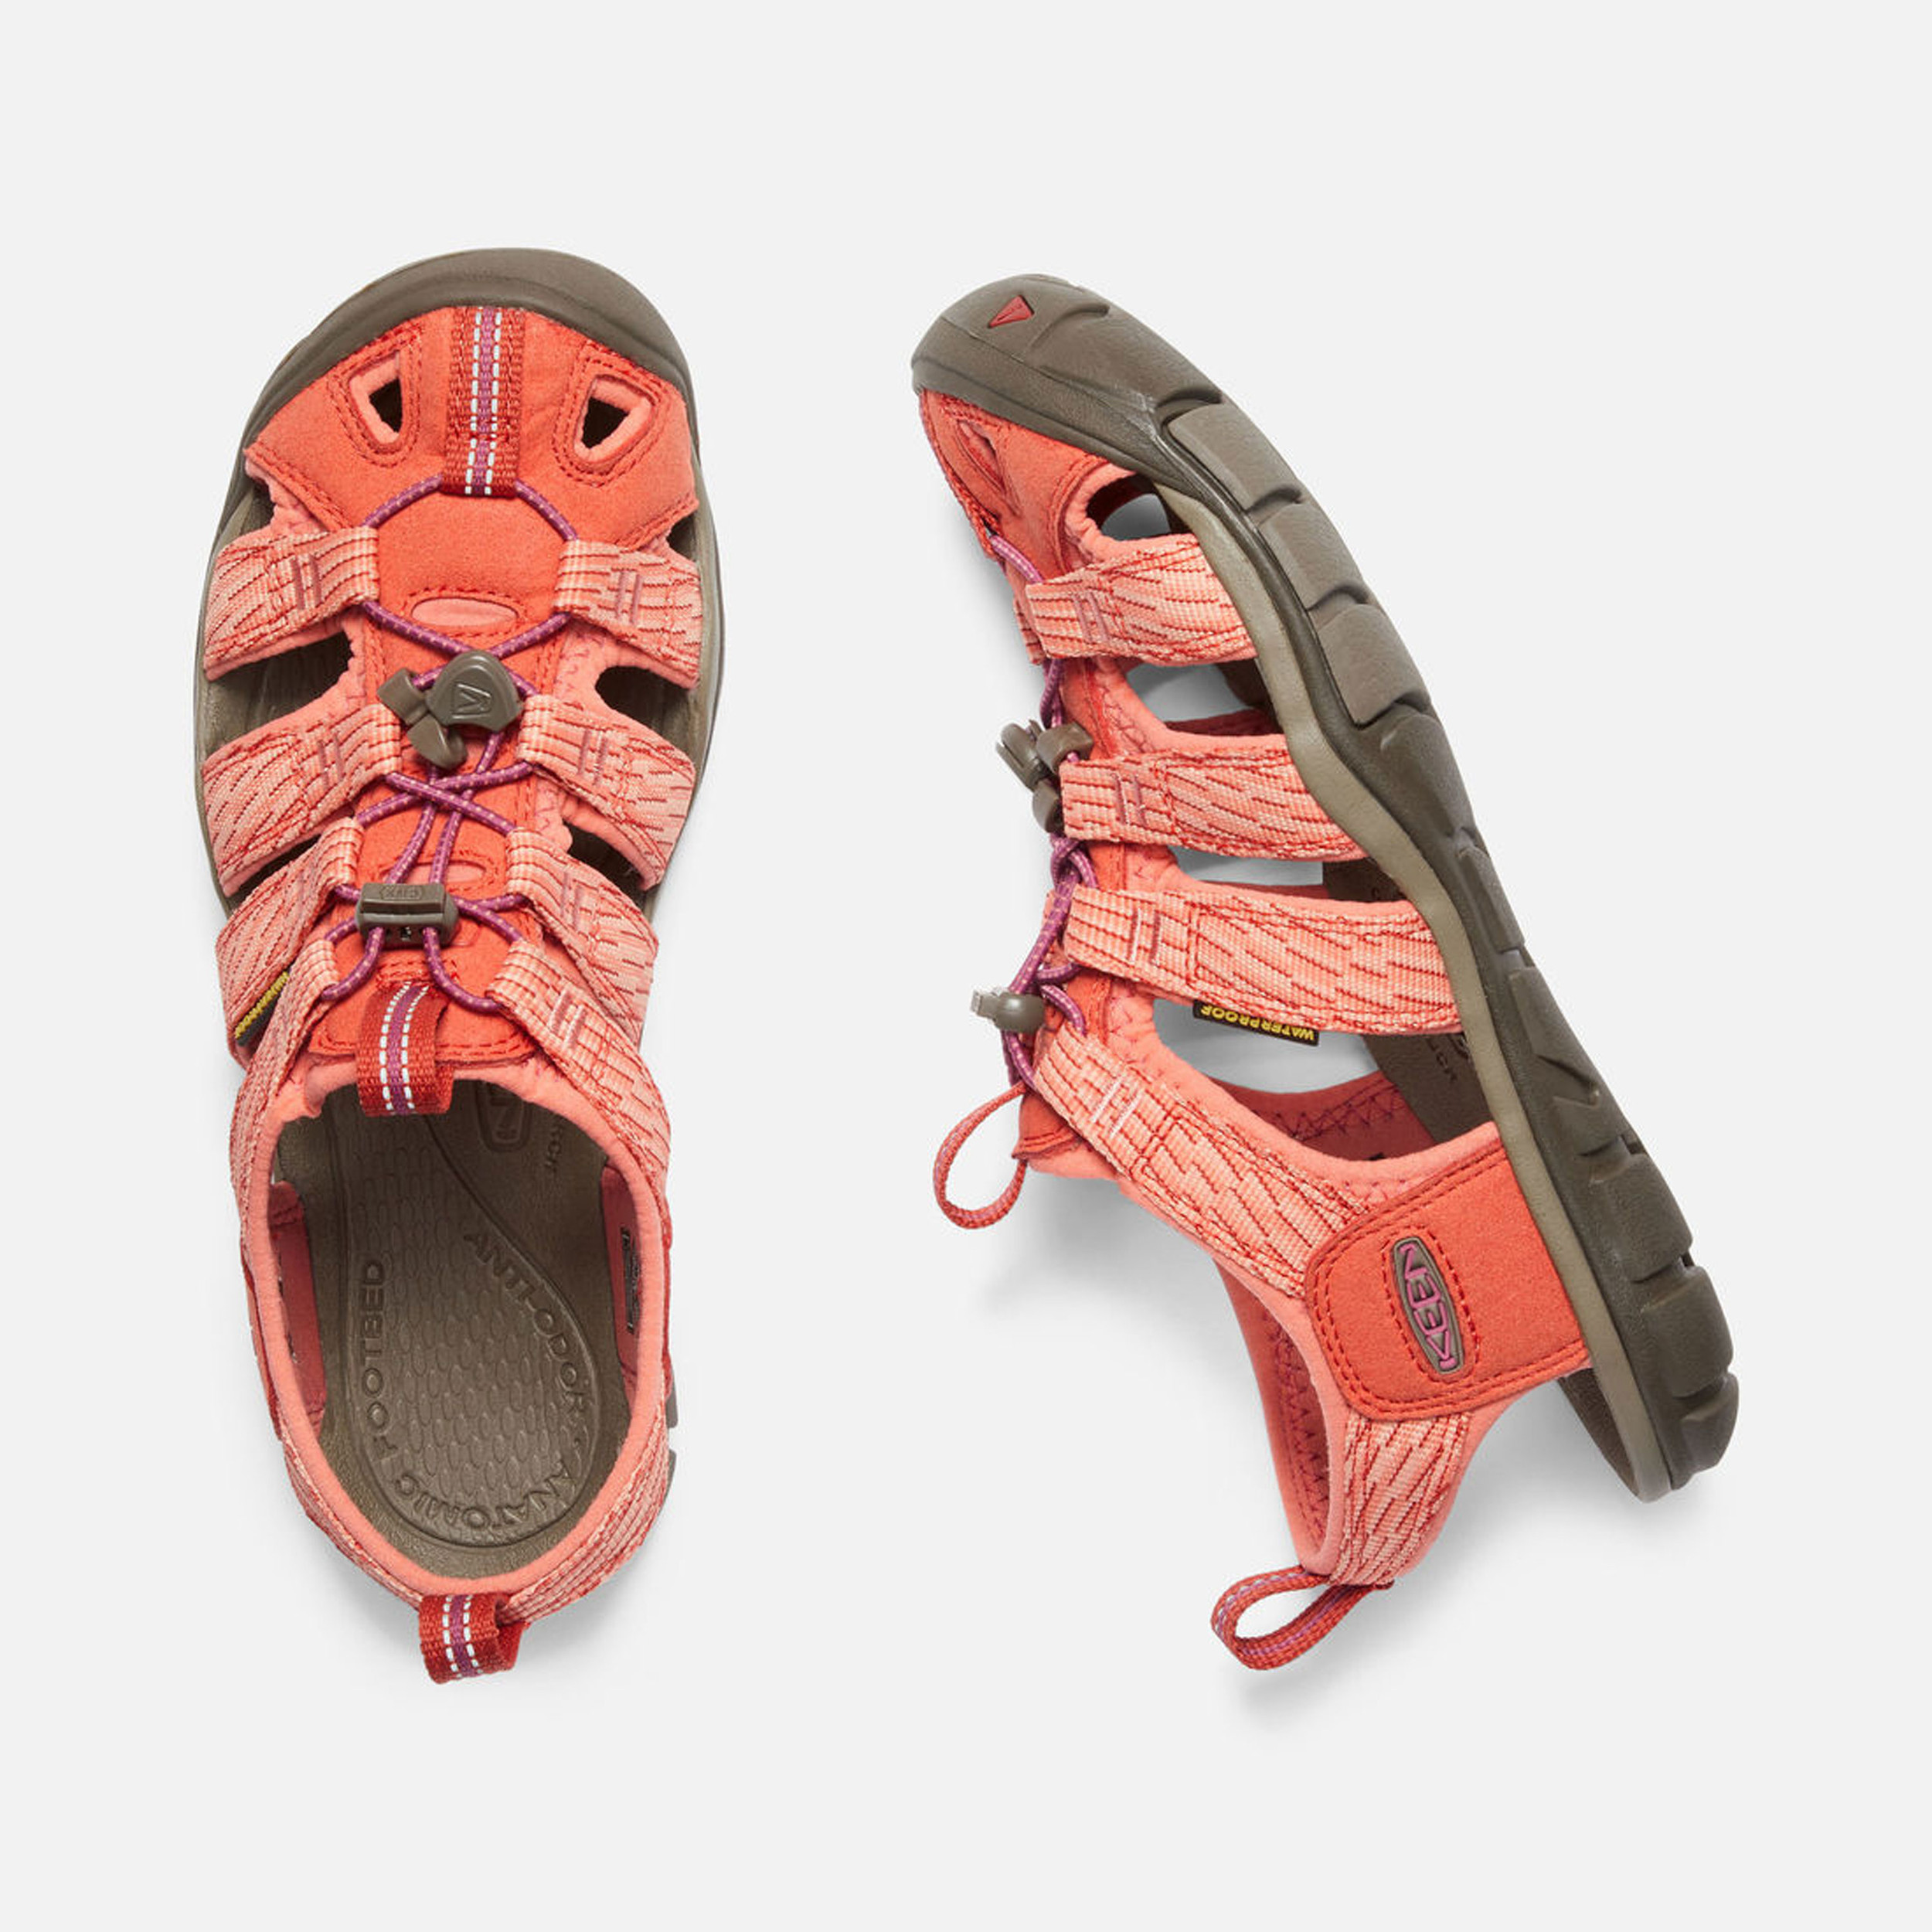 e38fff78ed4 Keen Mujer Clearwater Cnx Caminar Sandalias Naranja Deporte Exterior Calzado